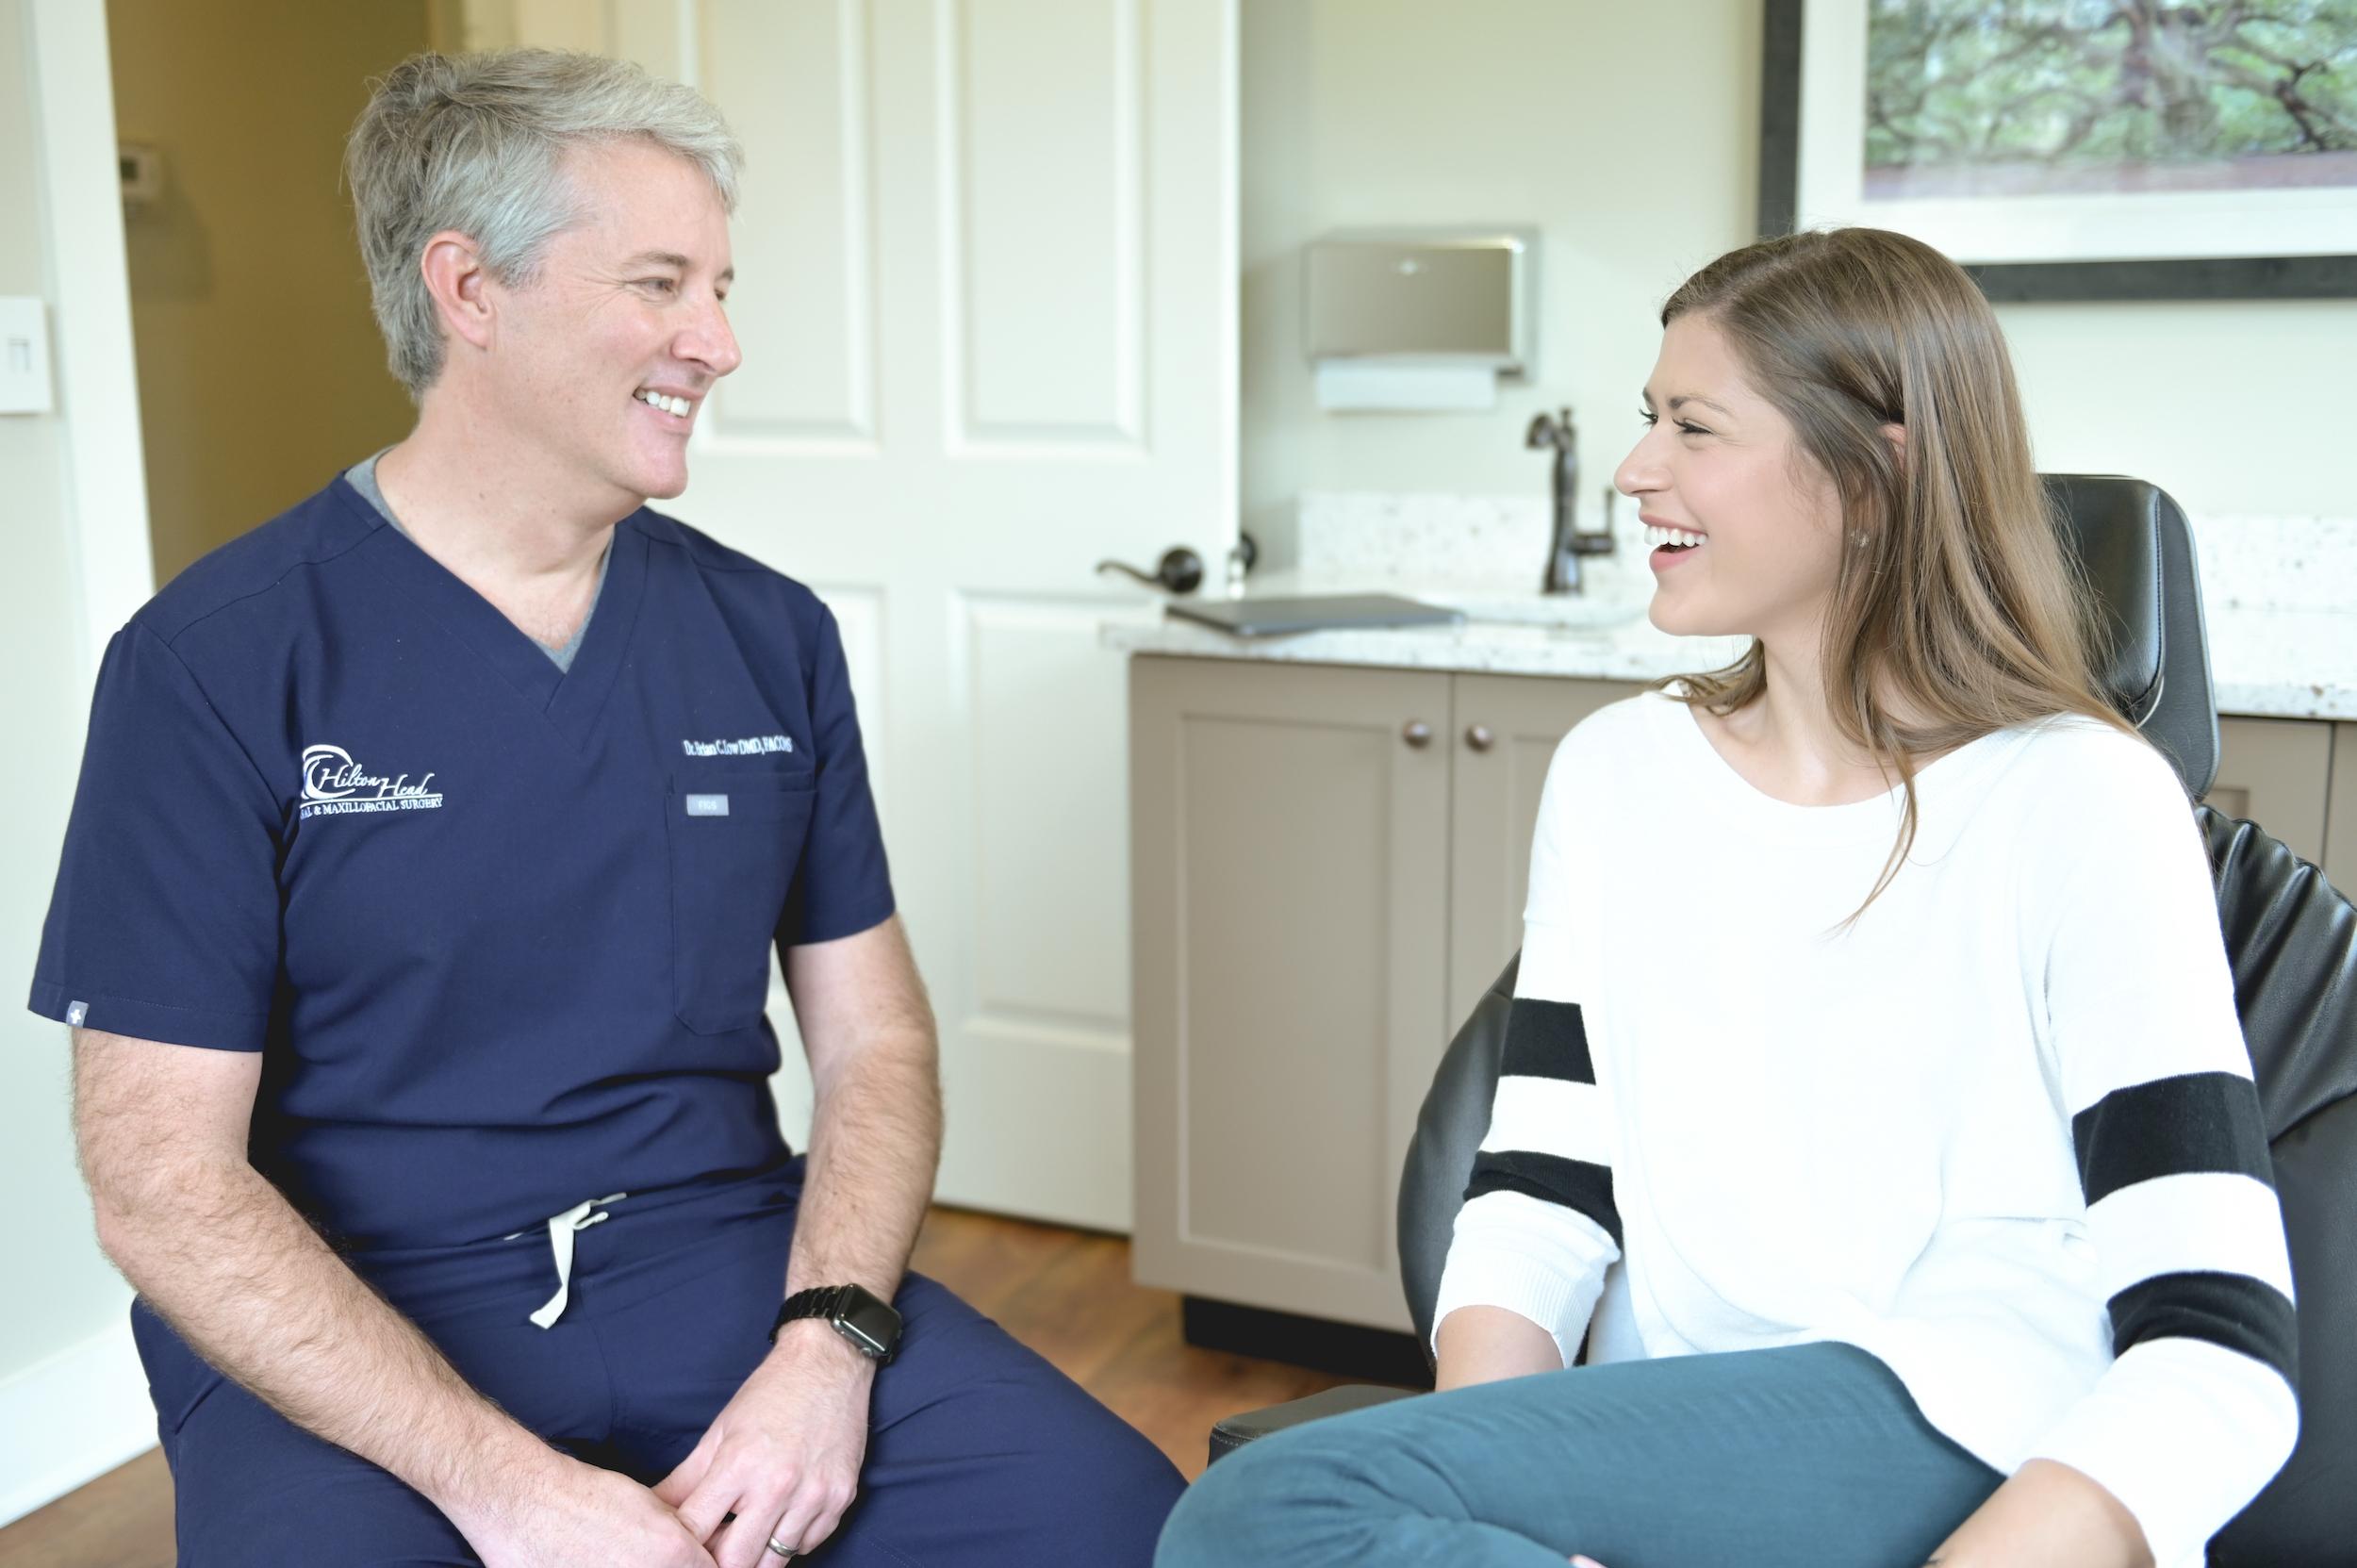 Hilton Head Oral & Maxillofacial Surgery background image